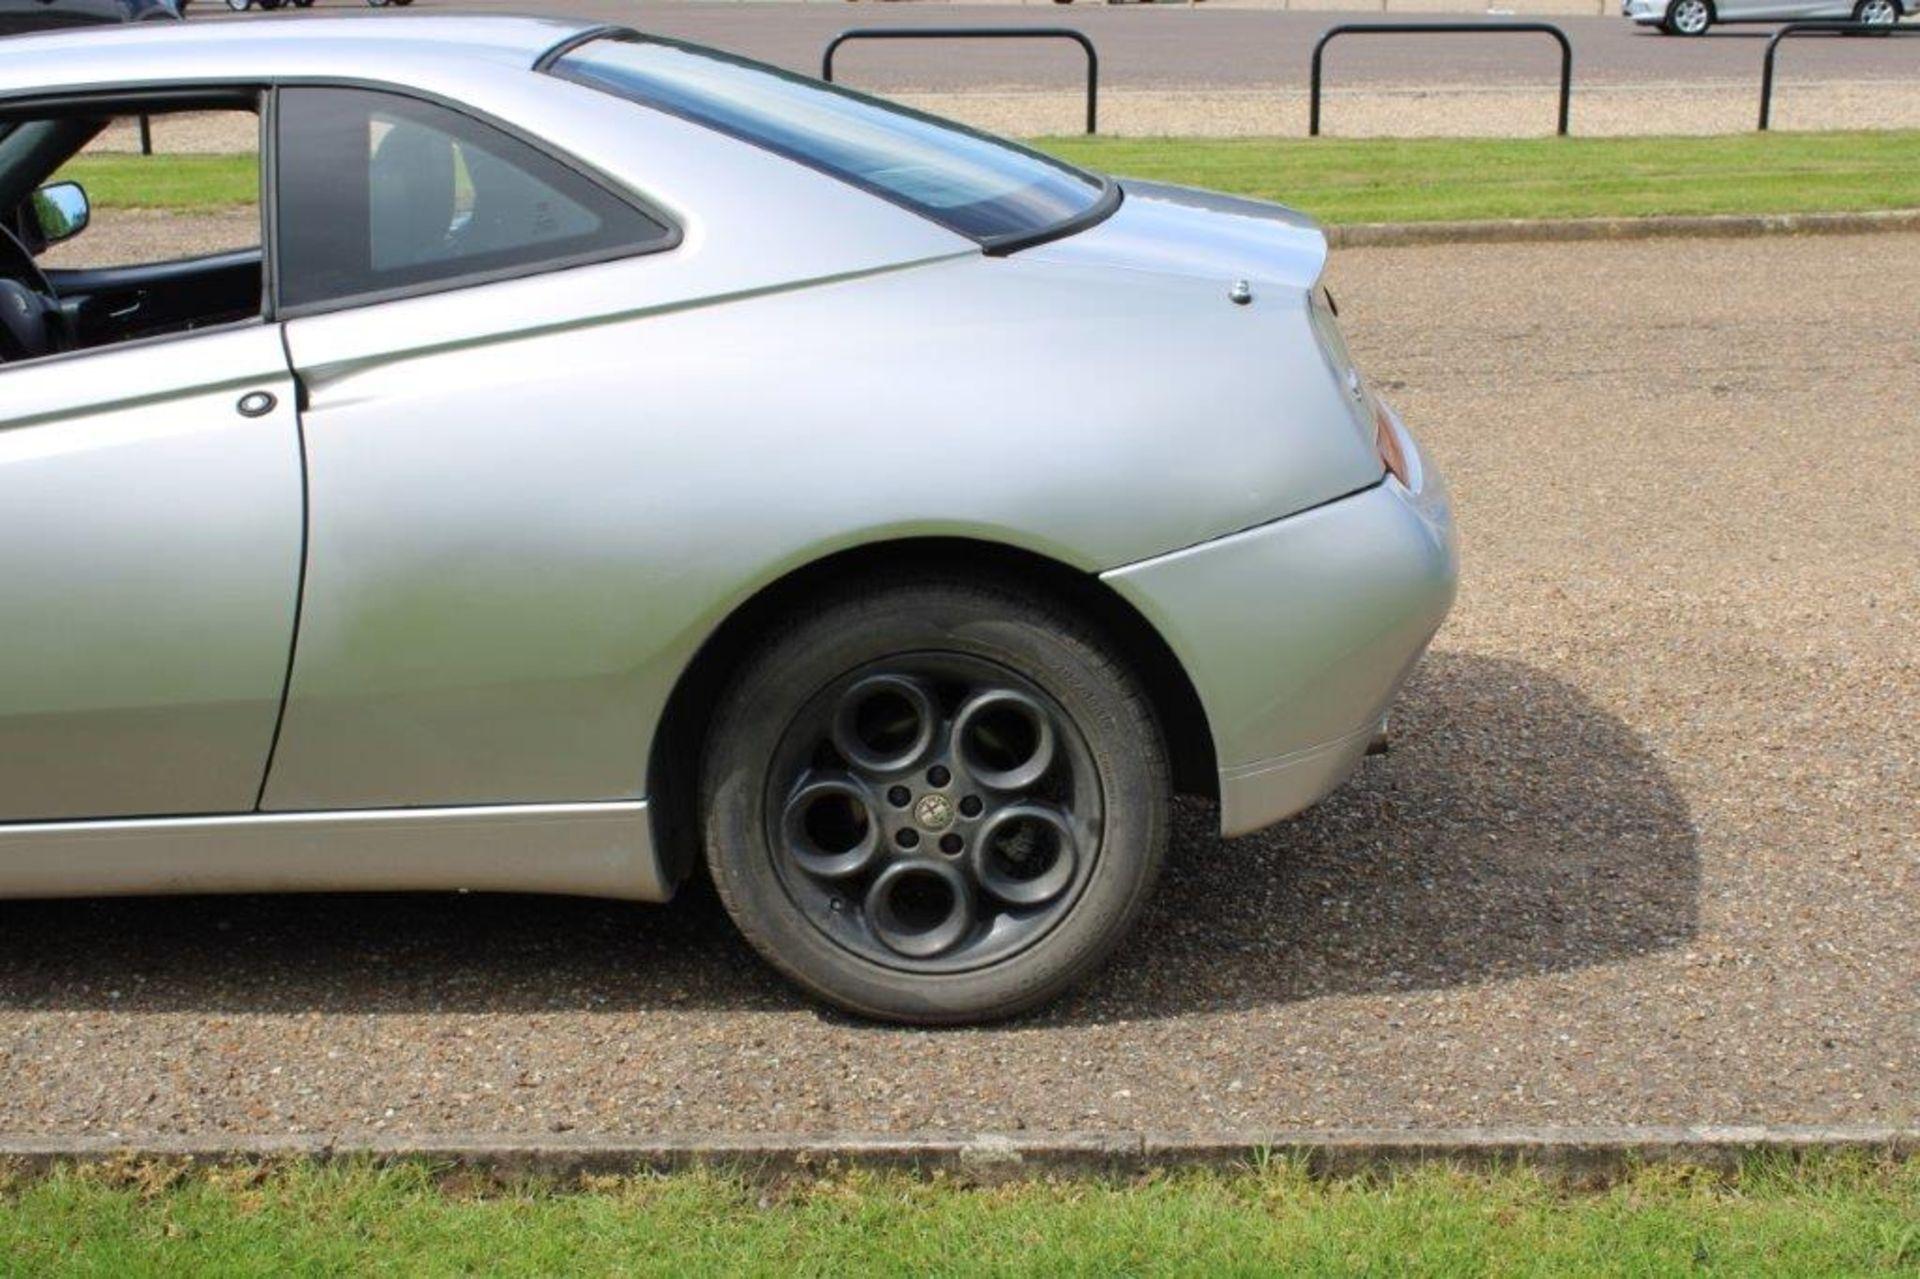 1999 Alfa Romeo GTV Lusso T-Spark 16v - Image 7 of 18